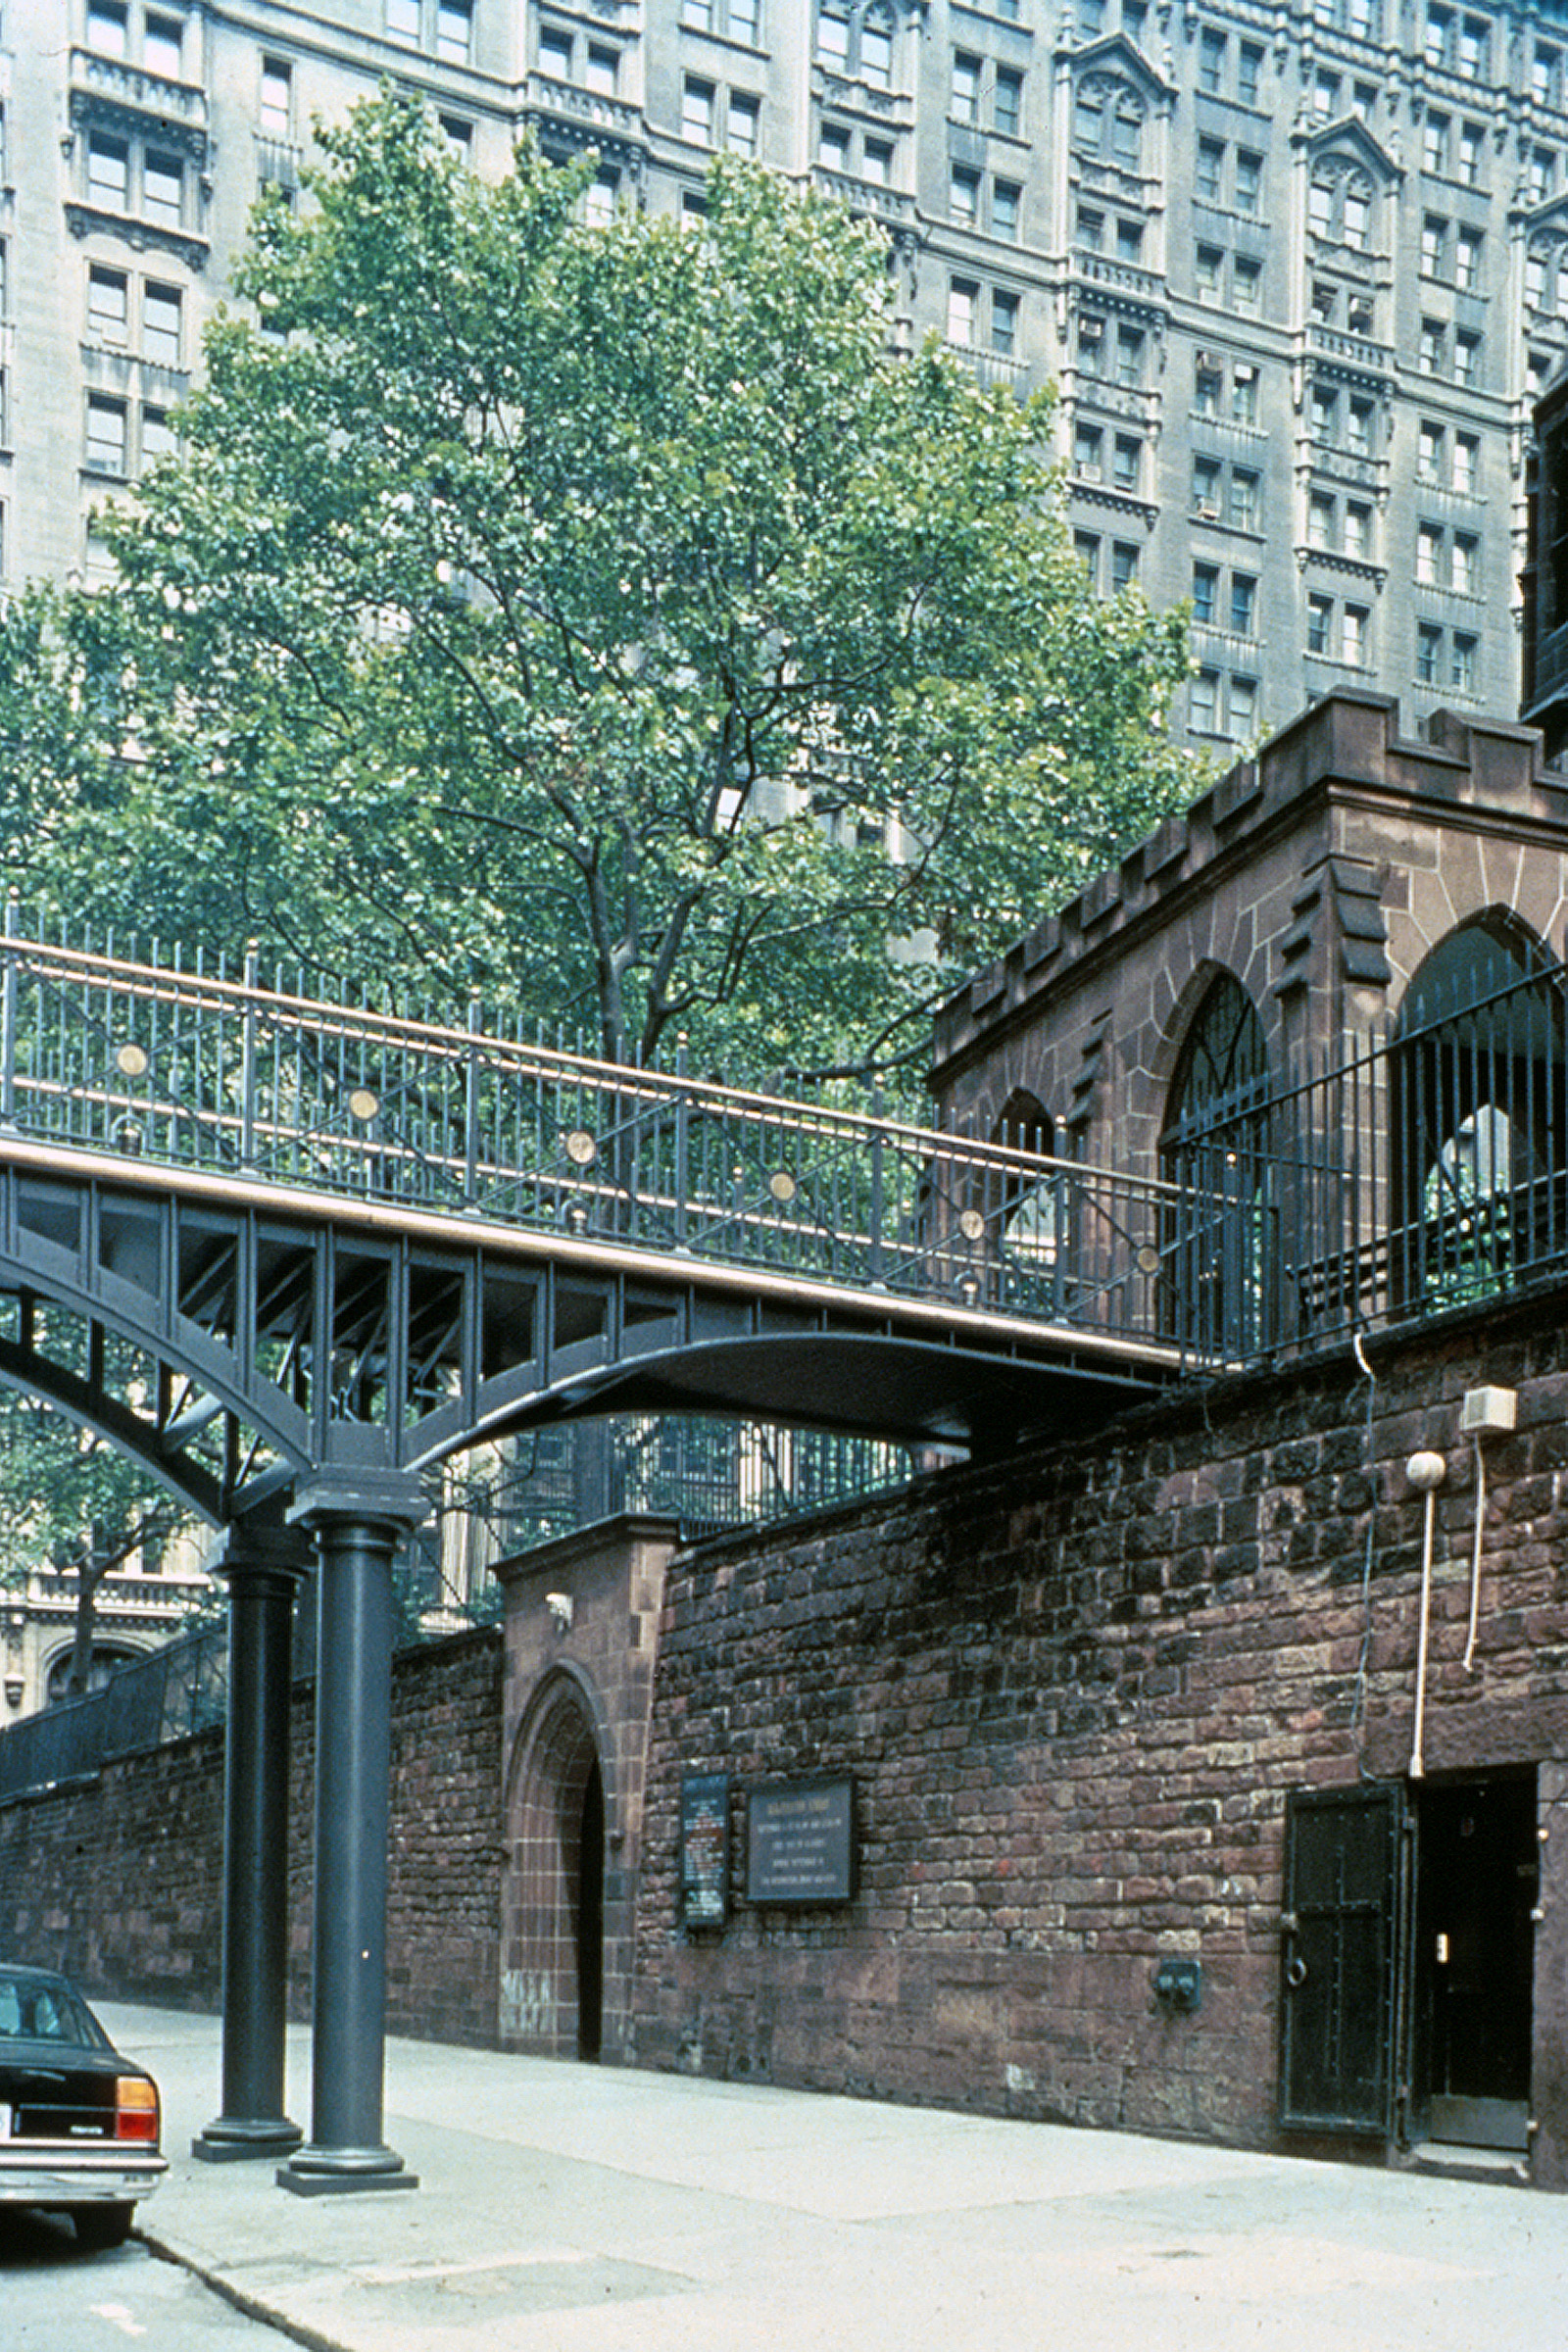 Trinity - Bridge Shot From Street Level 2.jpg